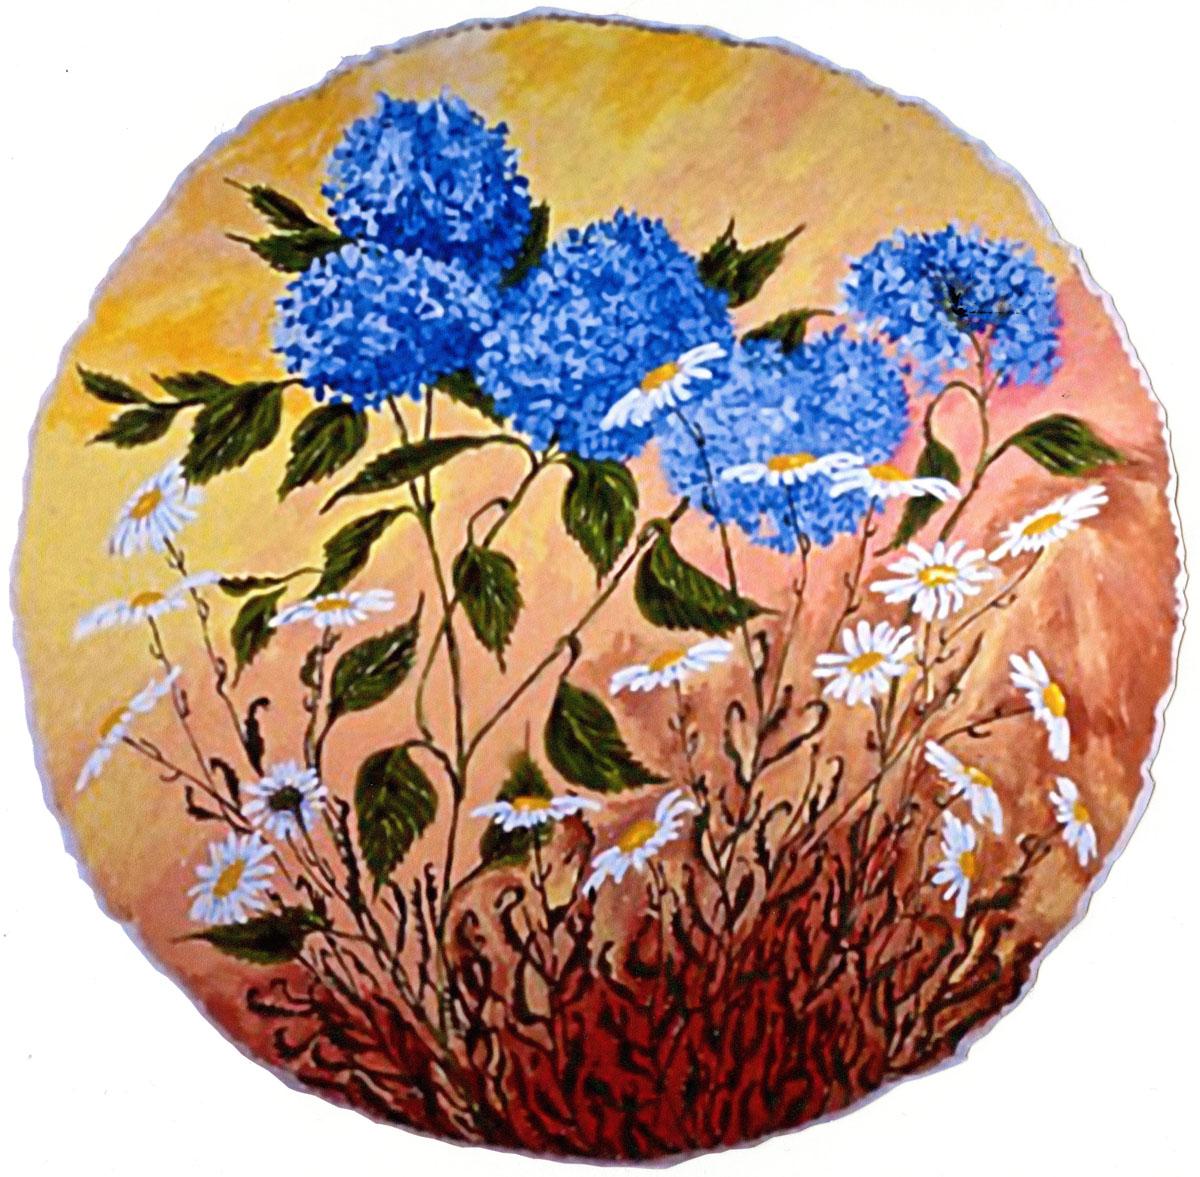 Hydrangeas Shasta Daisies: acrylic painting